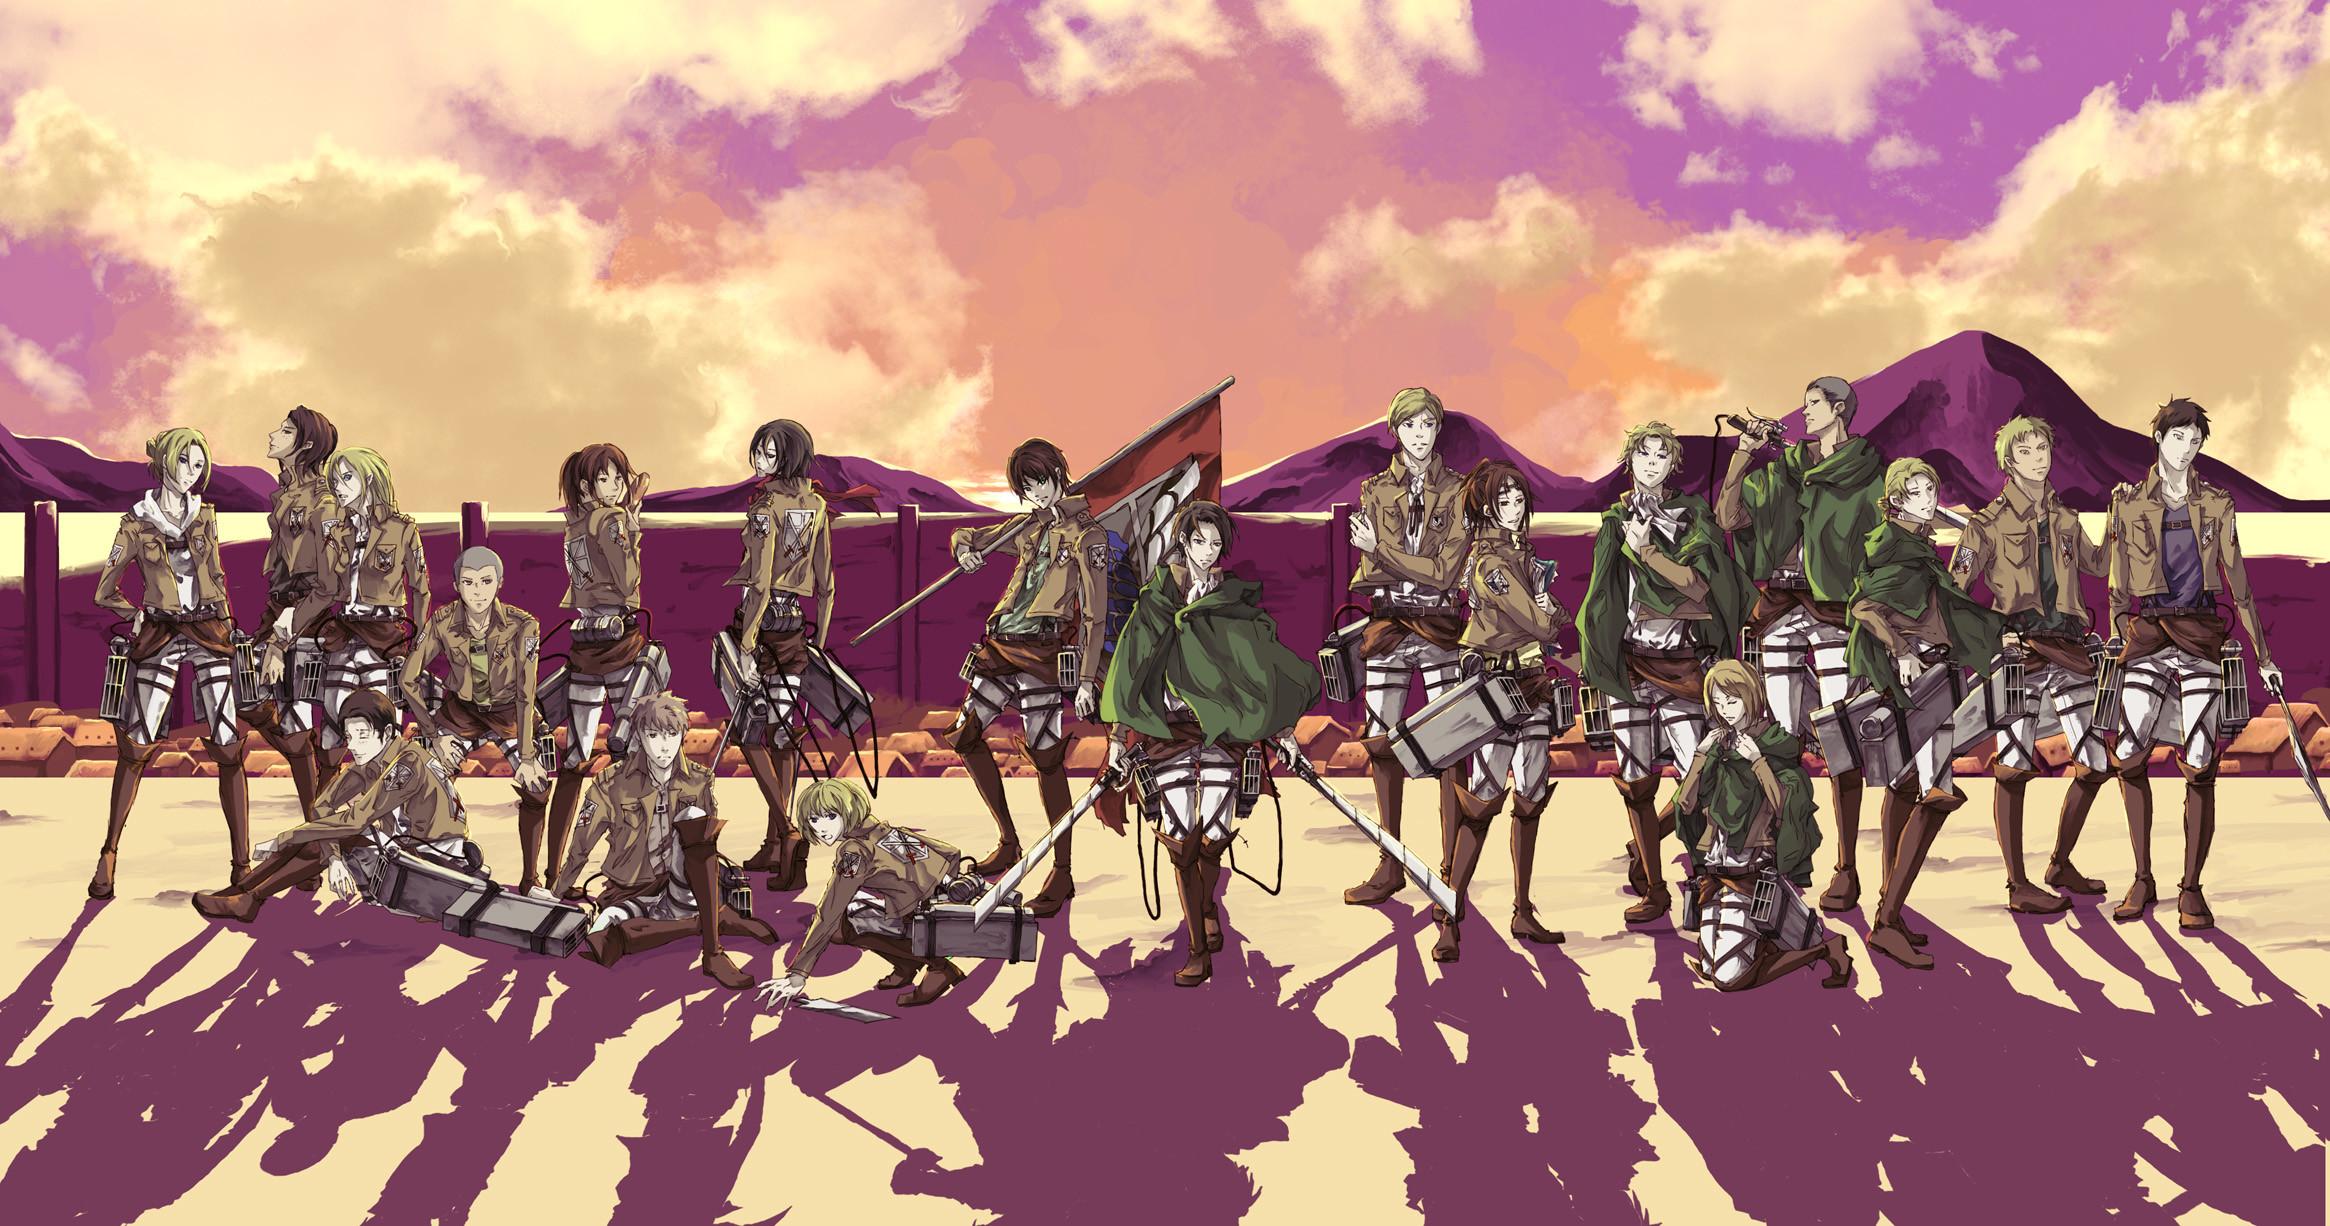 Shingeki-no-Kyojin-wallpaper-anime.jpg (JPEG-Grafik,